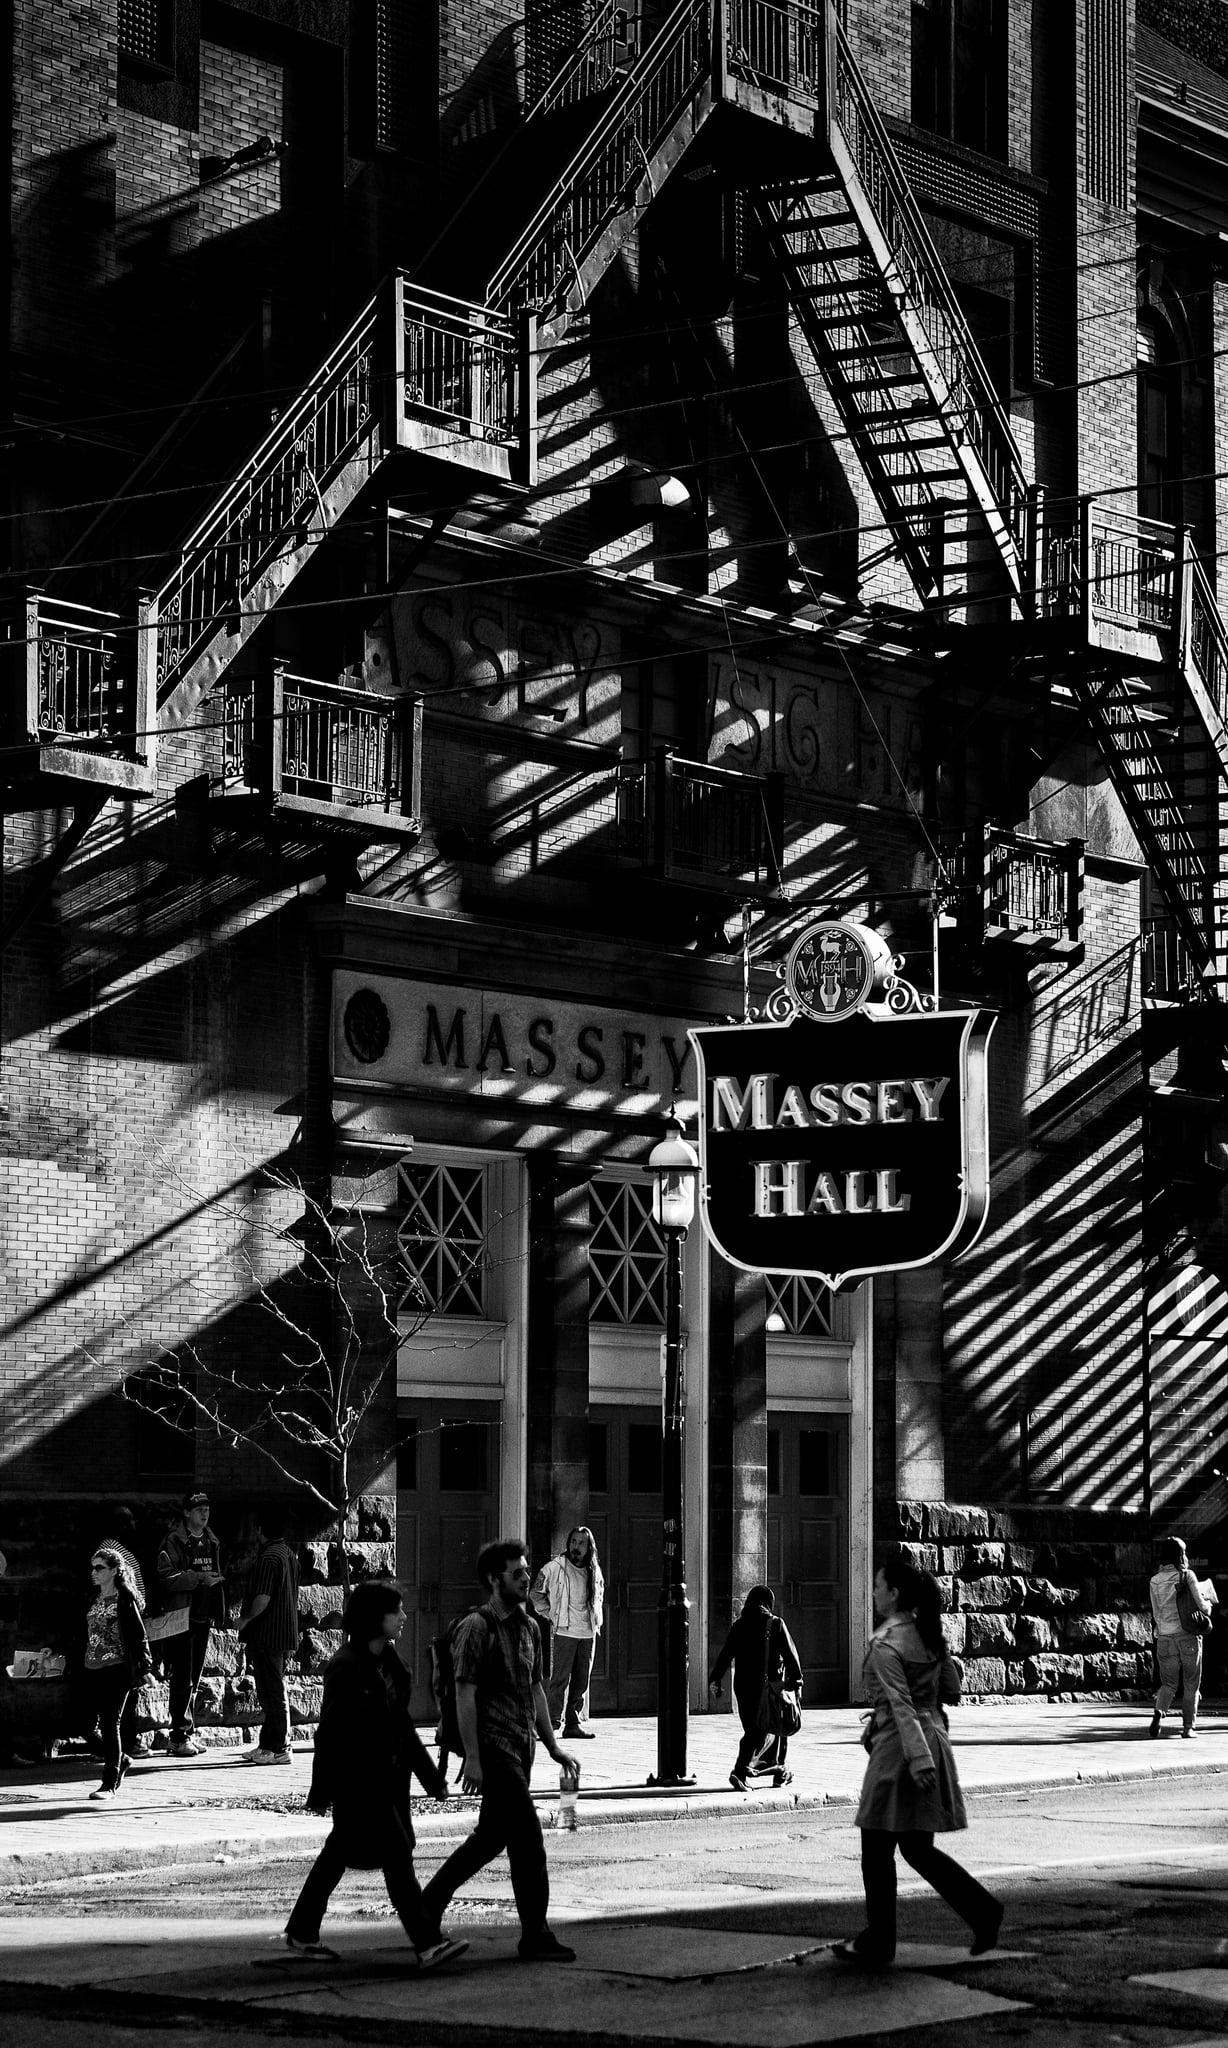 massey-hall_high-con_sunlight_shadow_bw_01.jpg